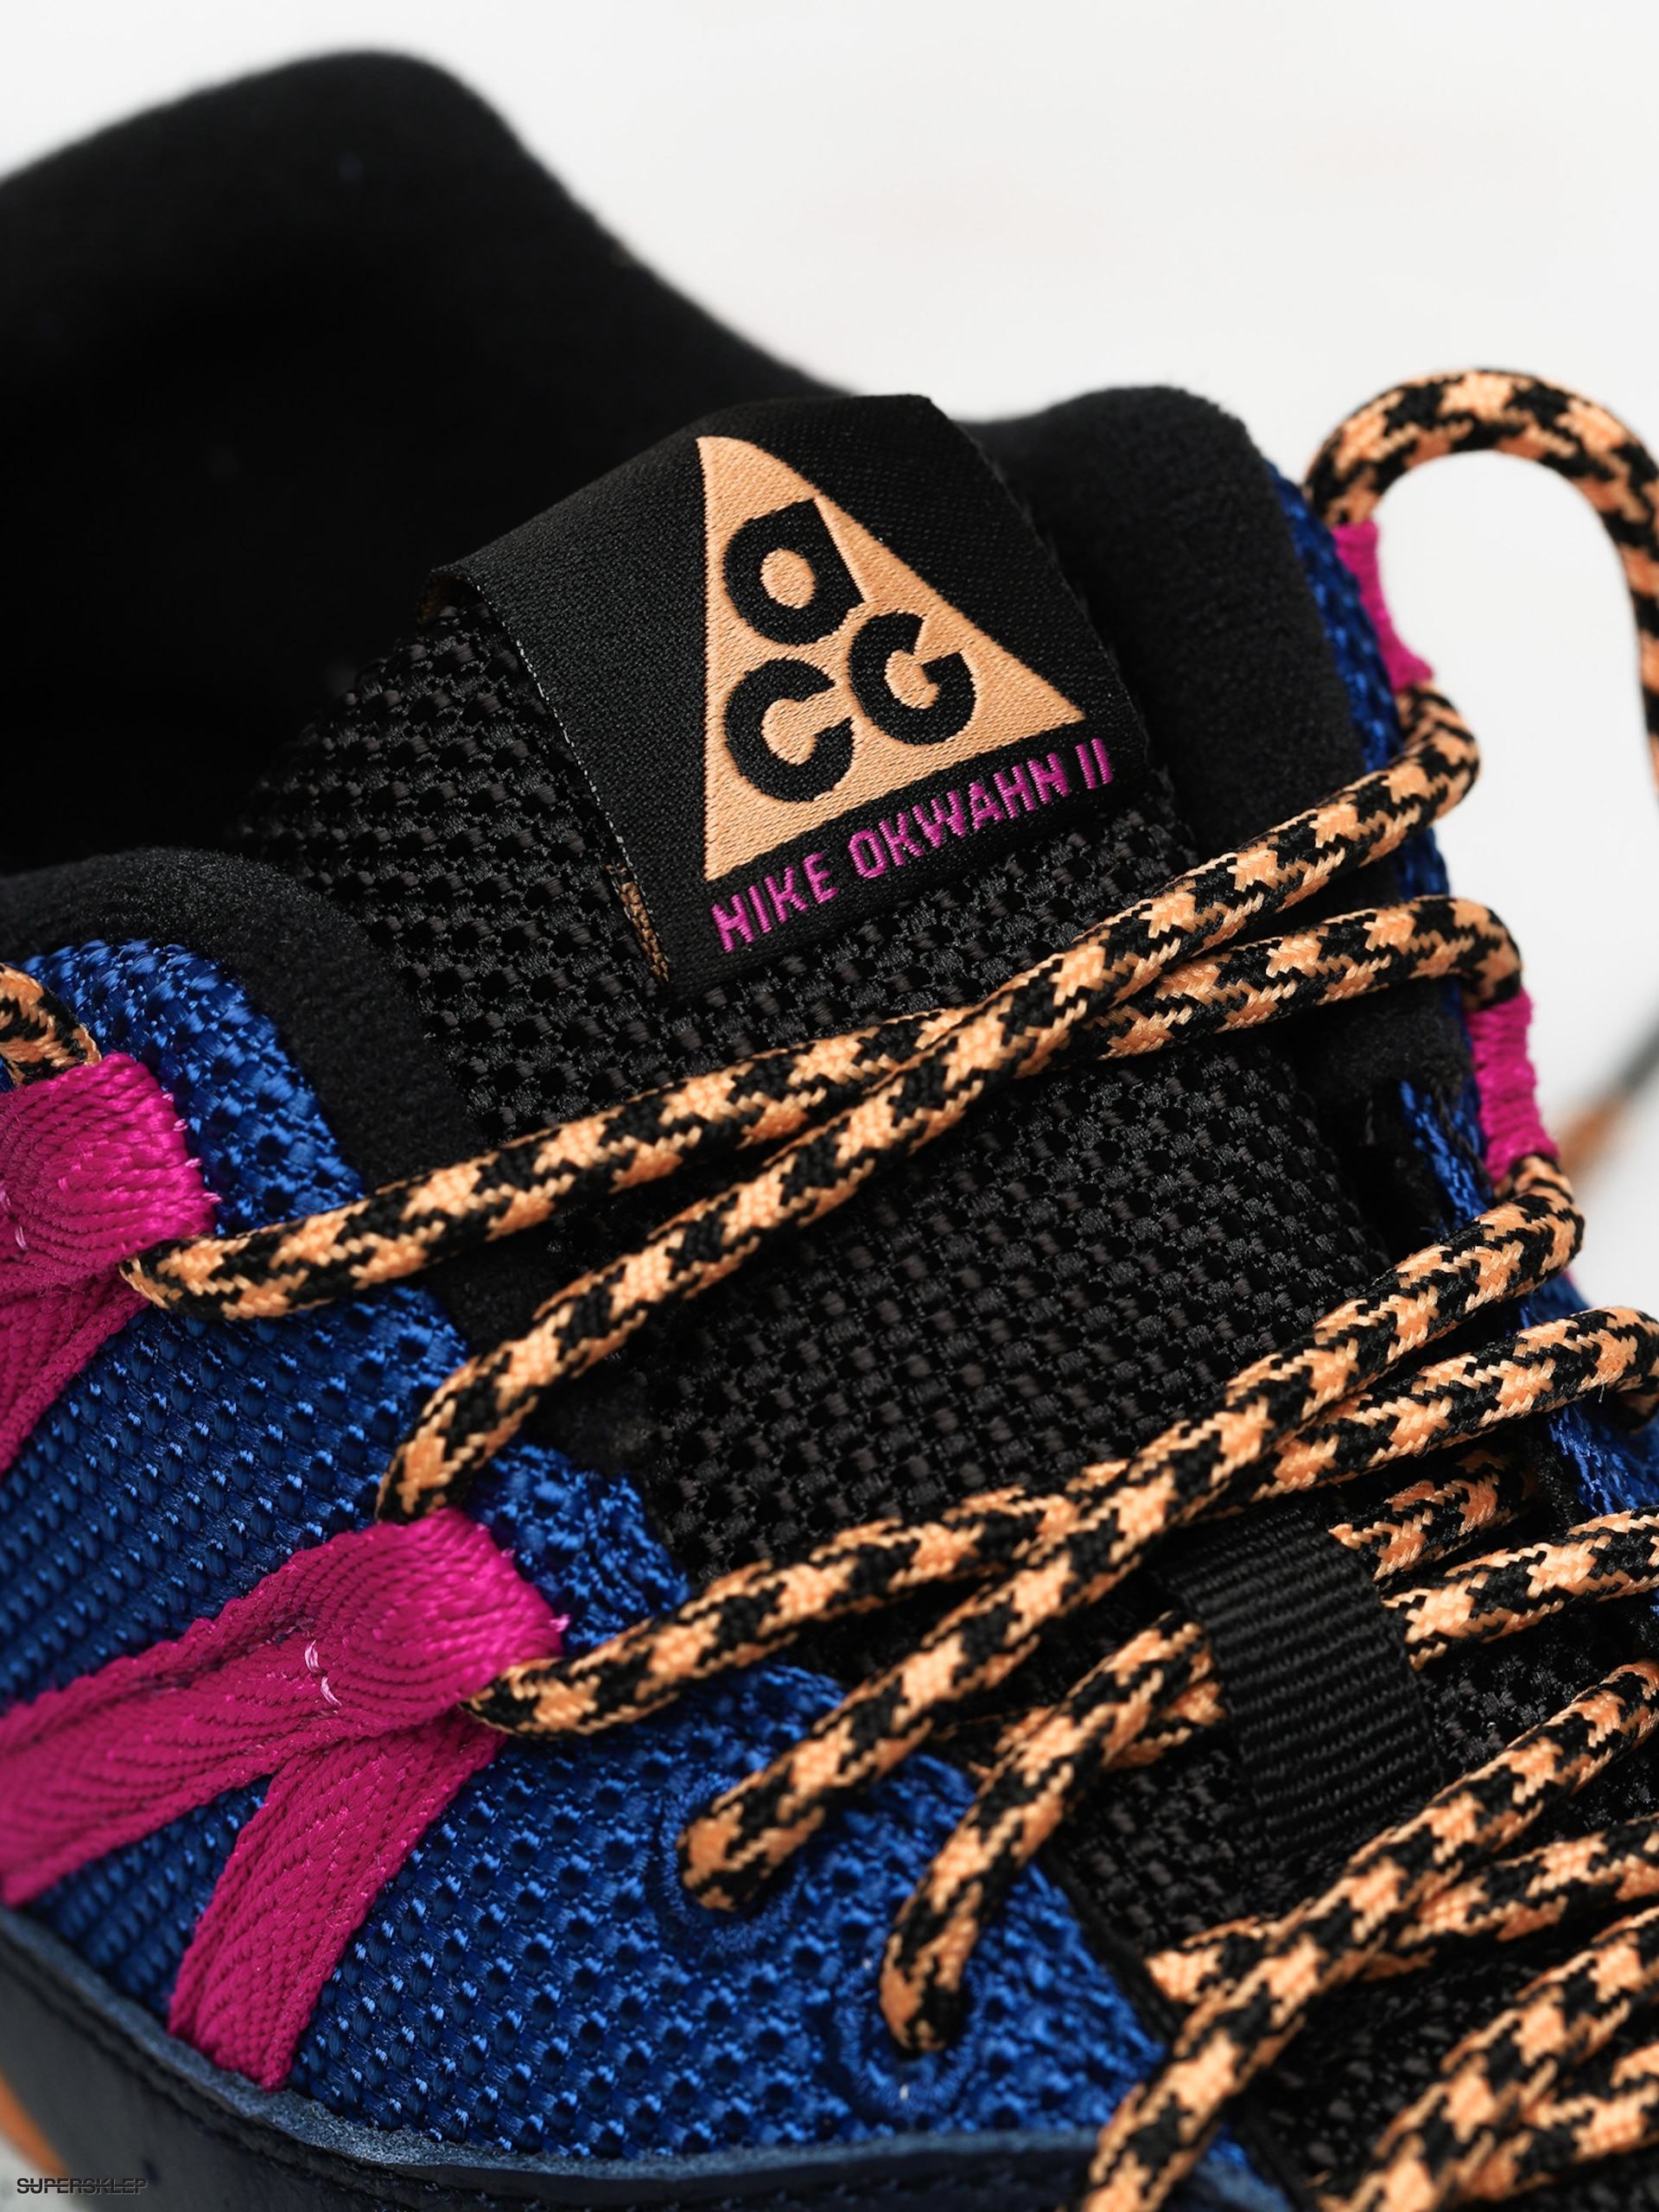 Buty Nike Okwahn II ACG (obsidianfuel orange indigo force)